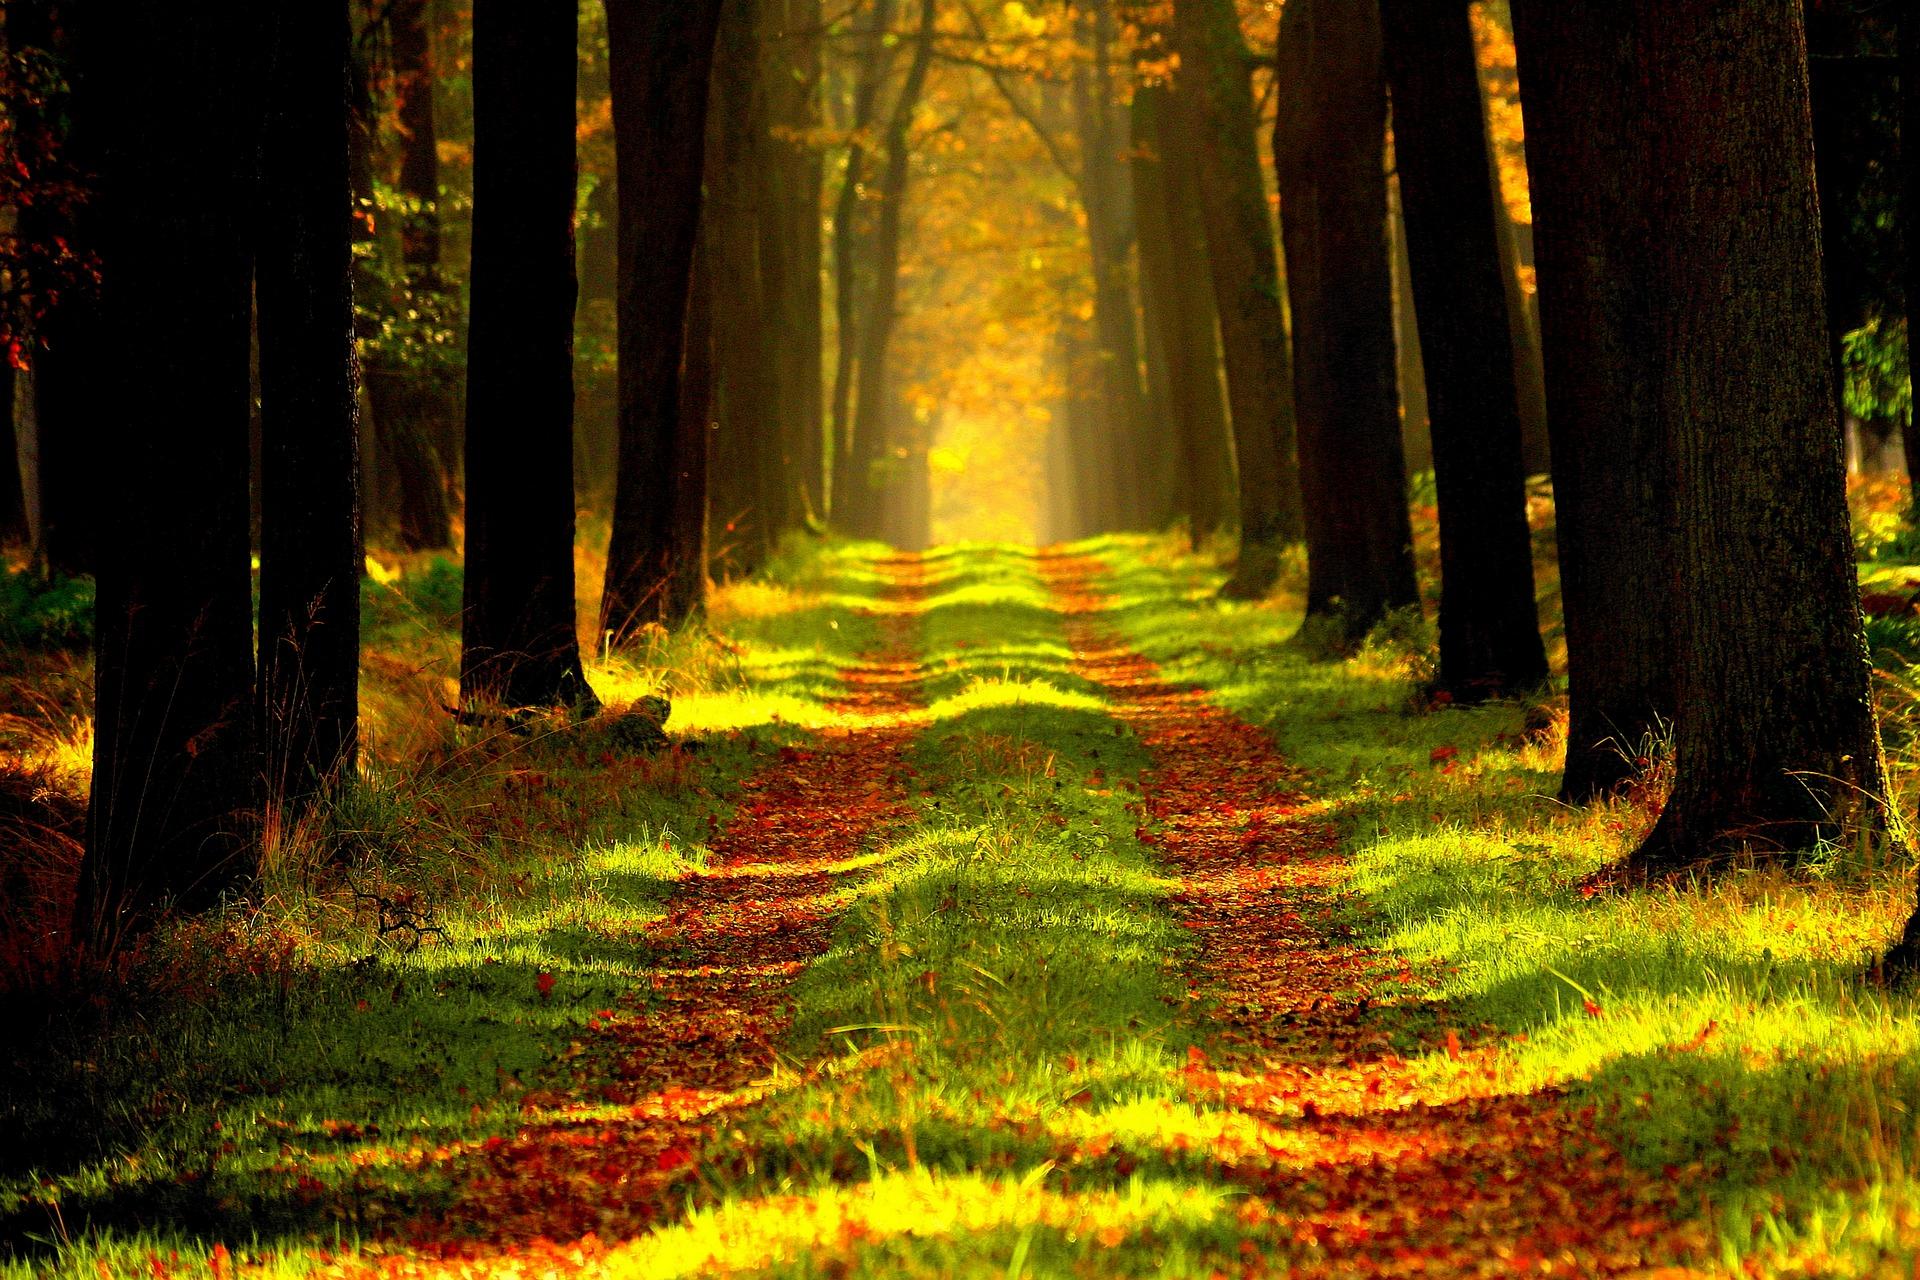 forest-868715_1920.jpg